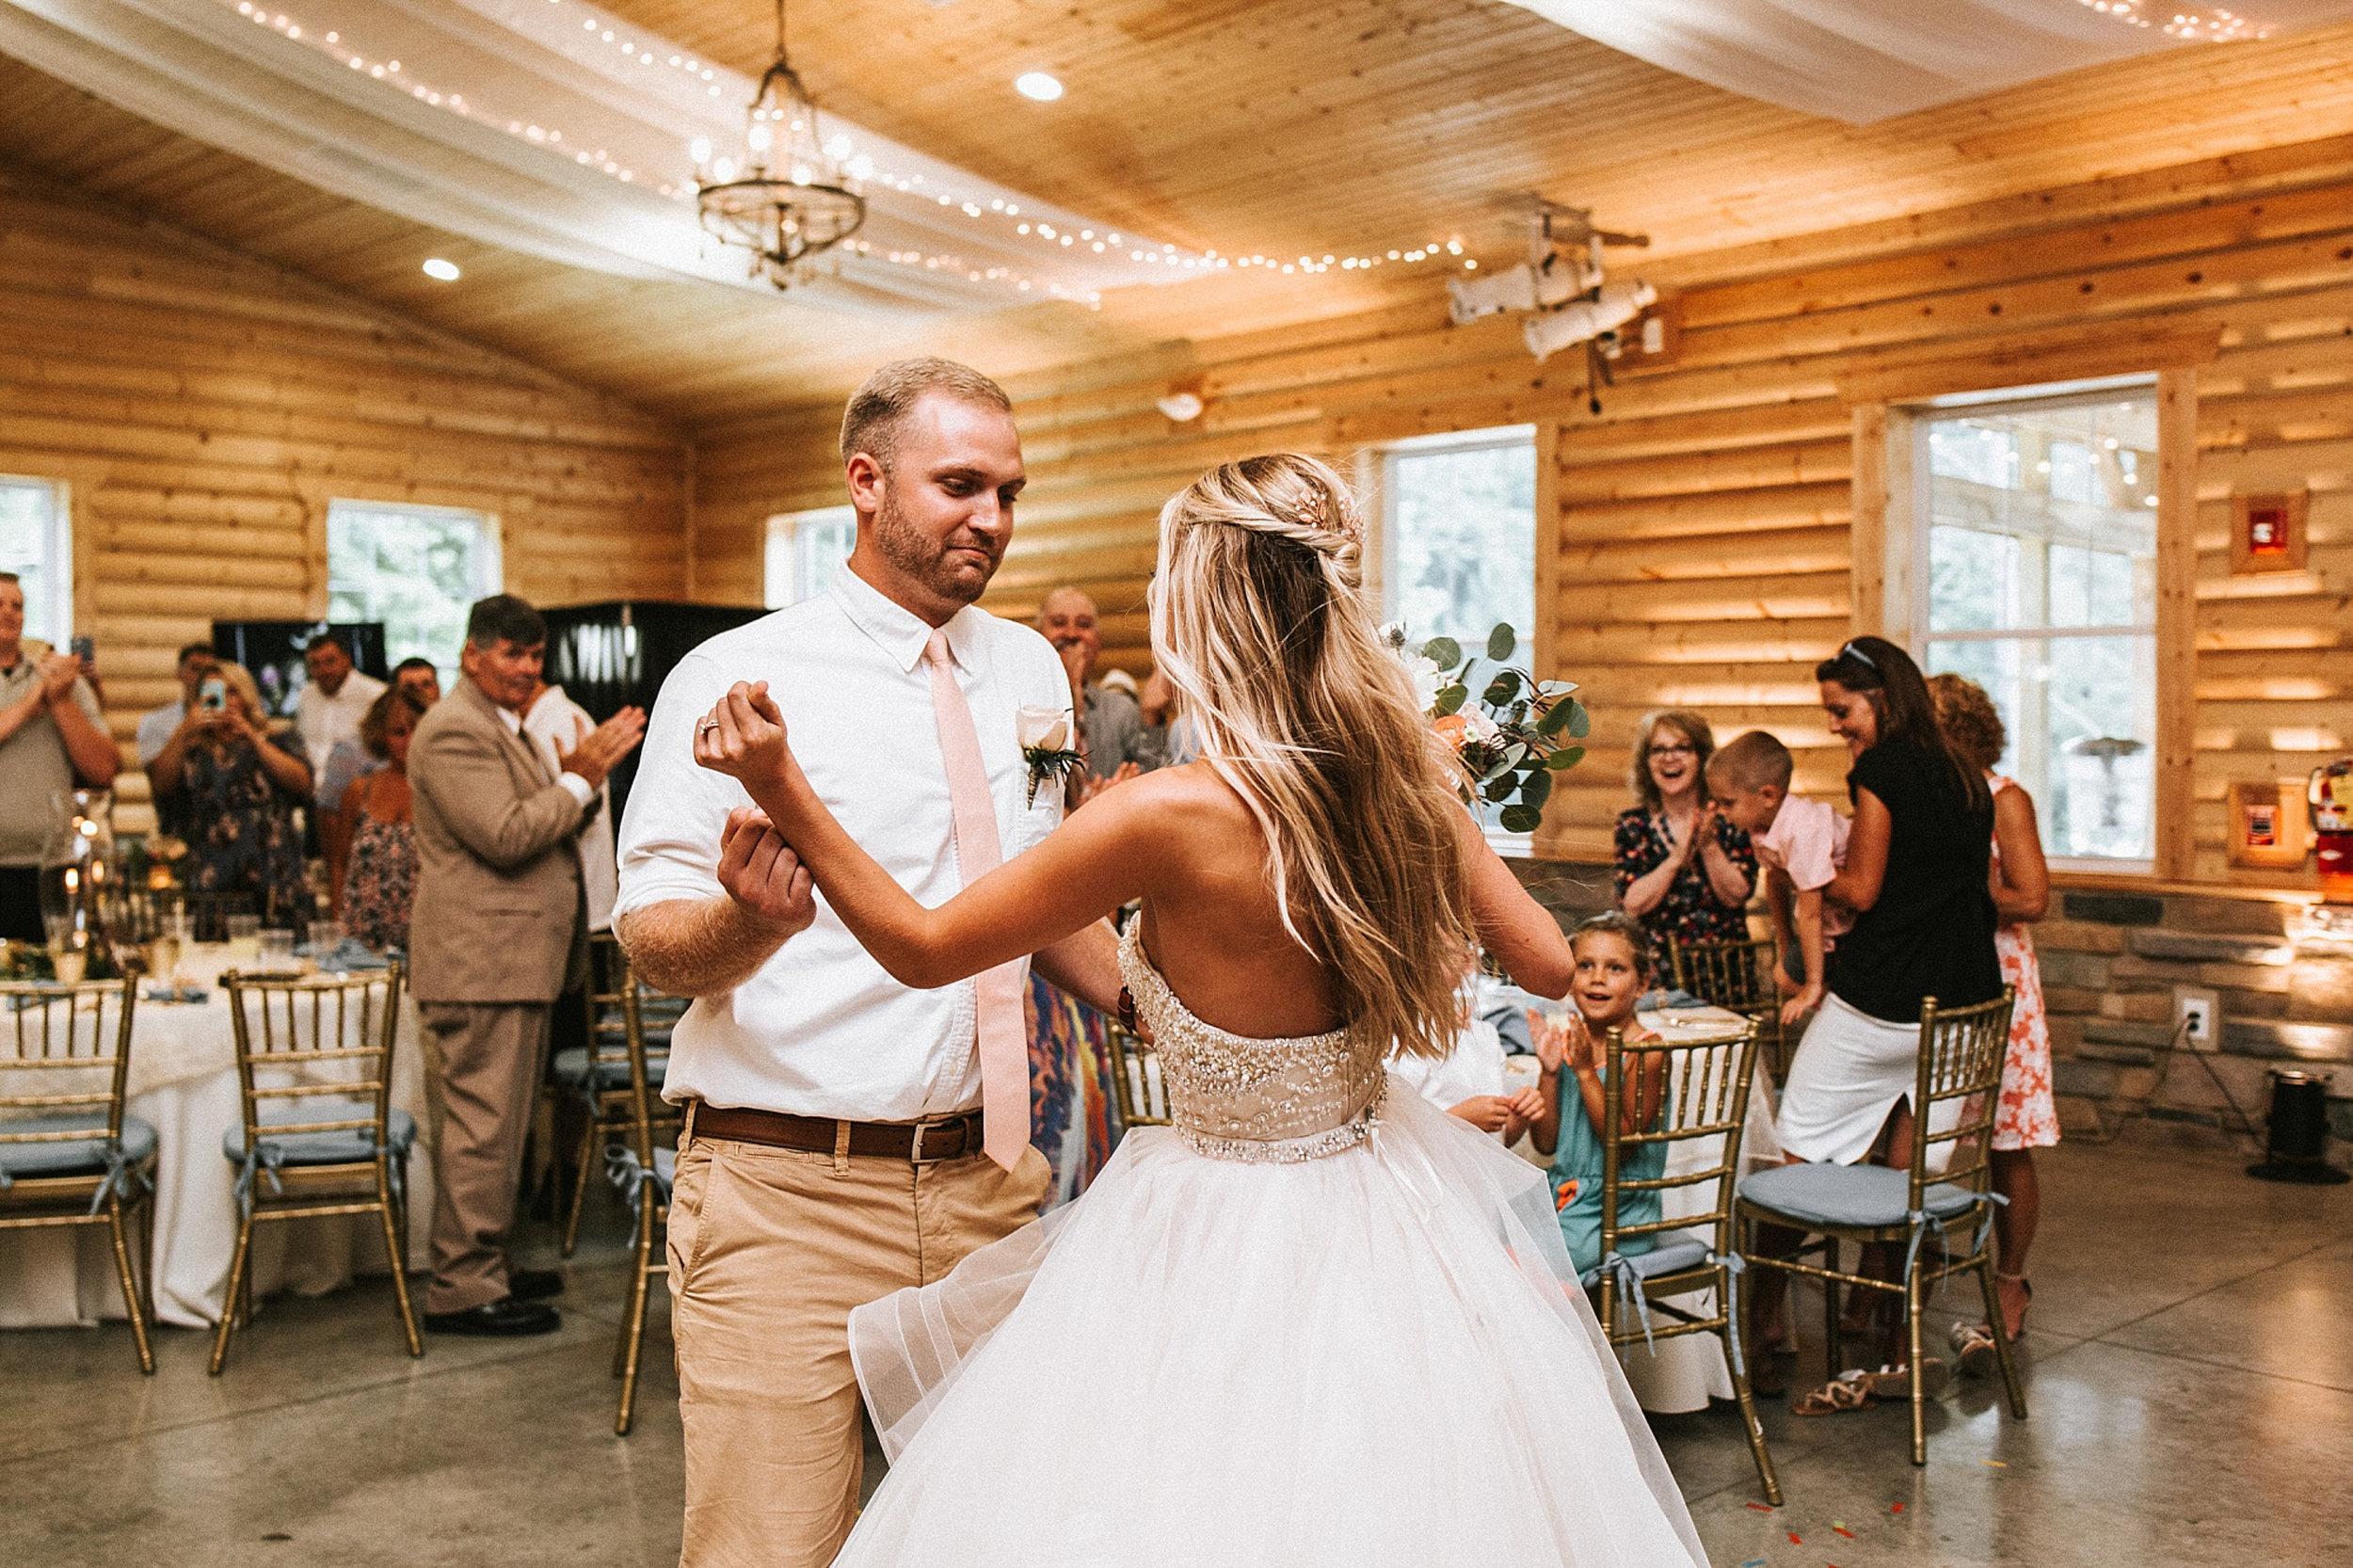 Brooke Townsend Photography - Cincinnati Wedding Photographer (125 of 153).jpg